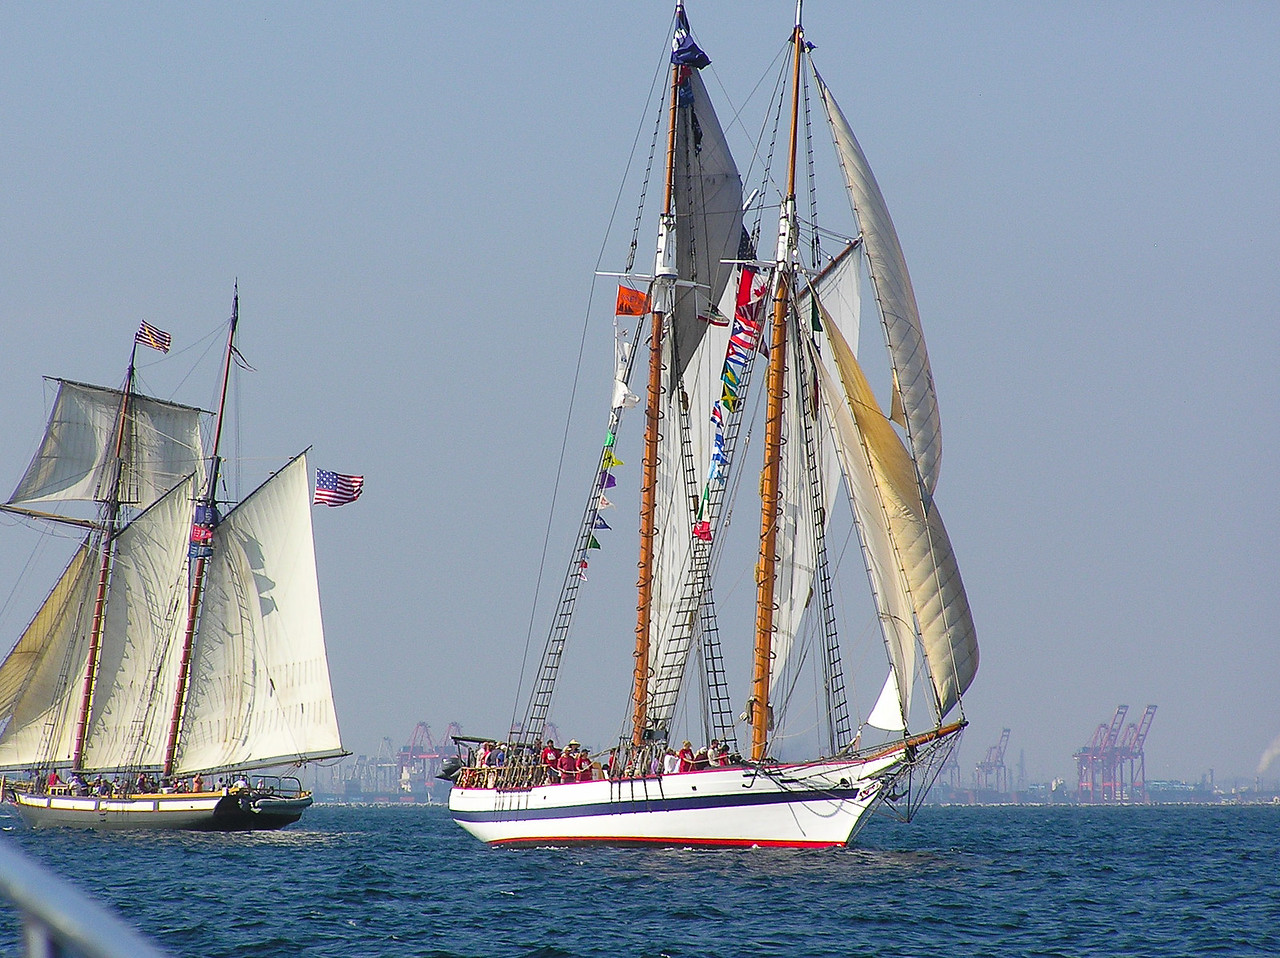 Tall Ships off of Long Beach, California. Taken in 2005.